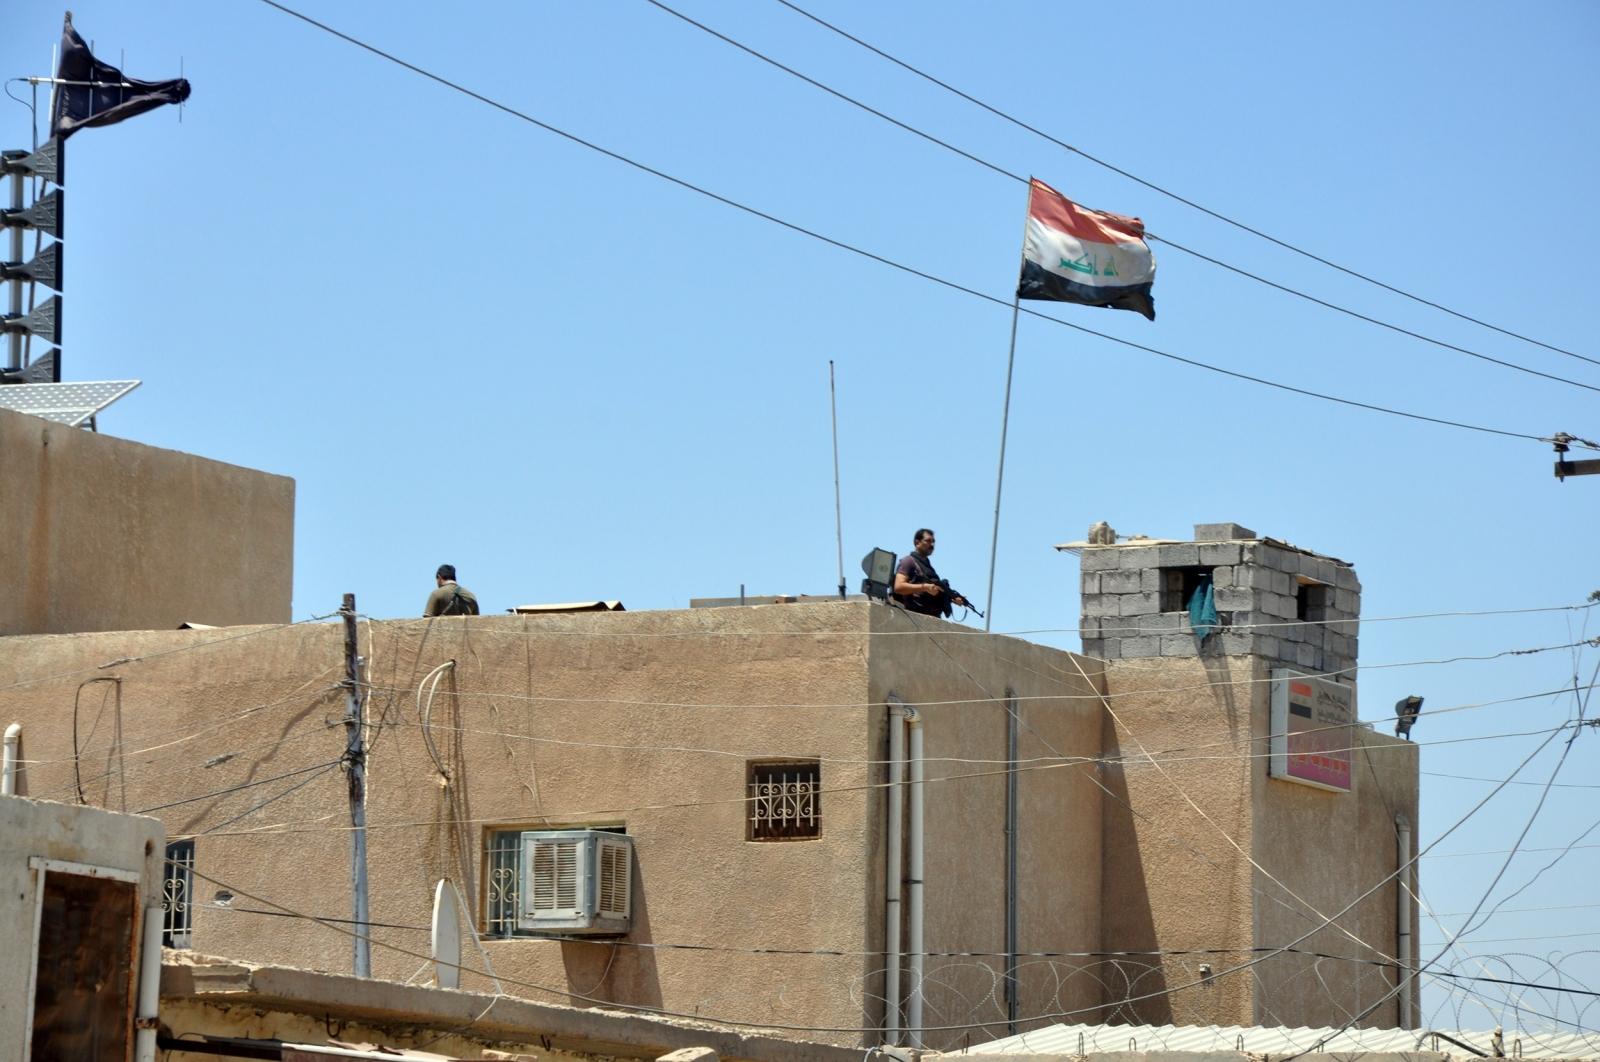 Prison in Iraq's Diyala province. More than